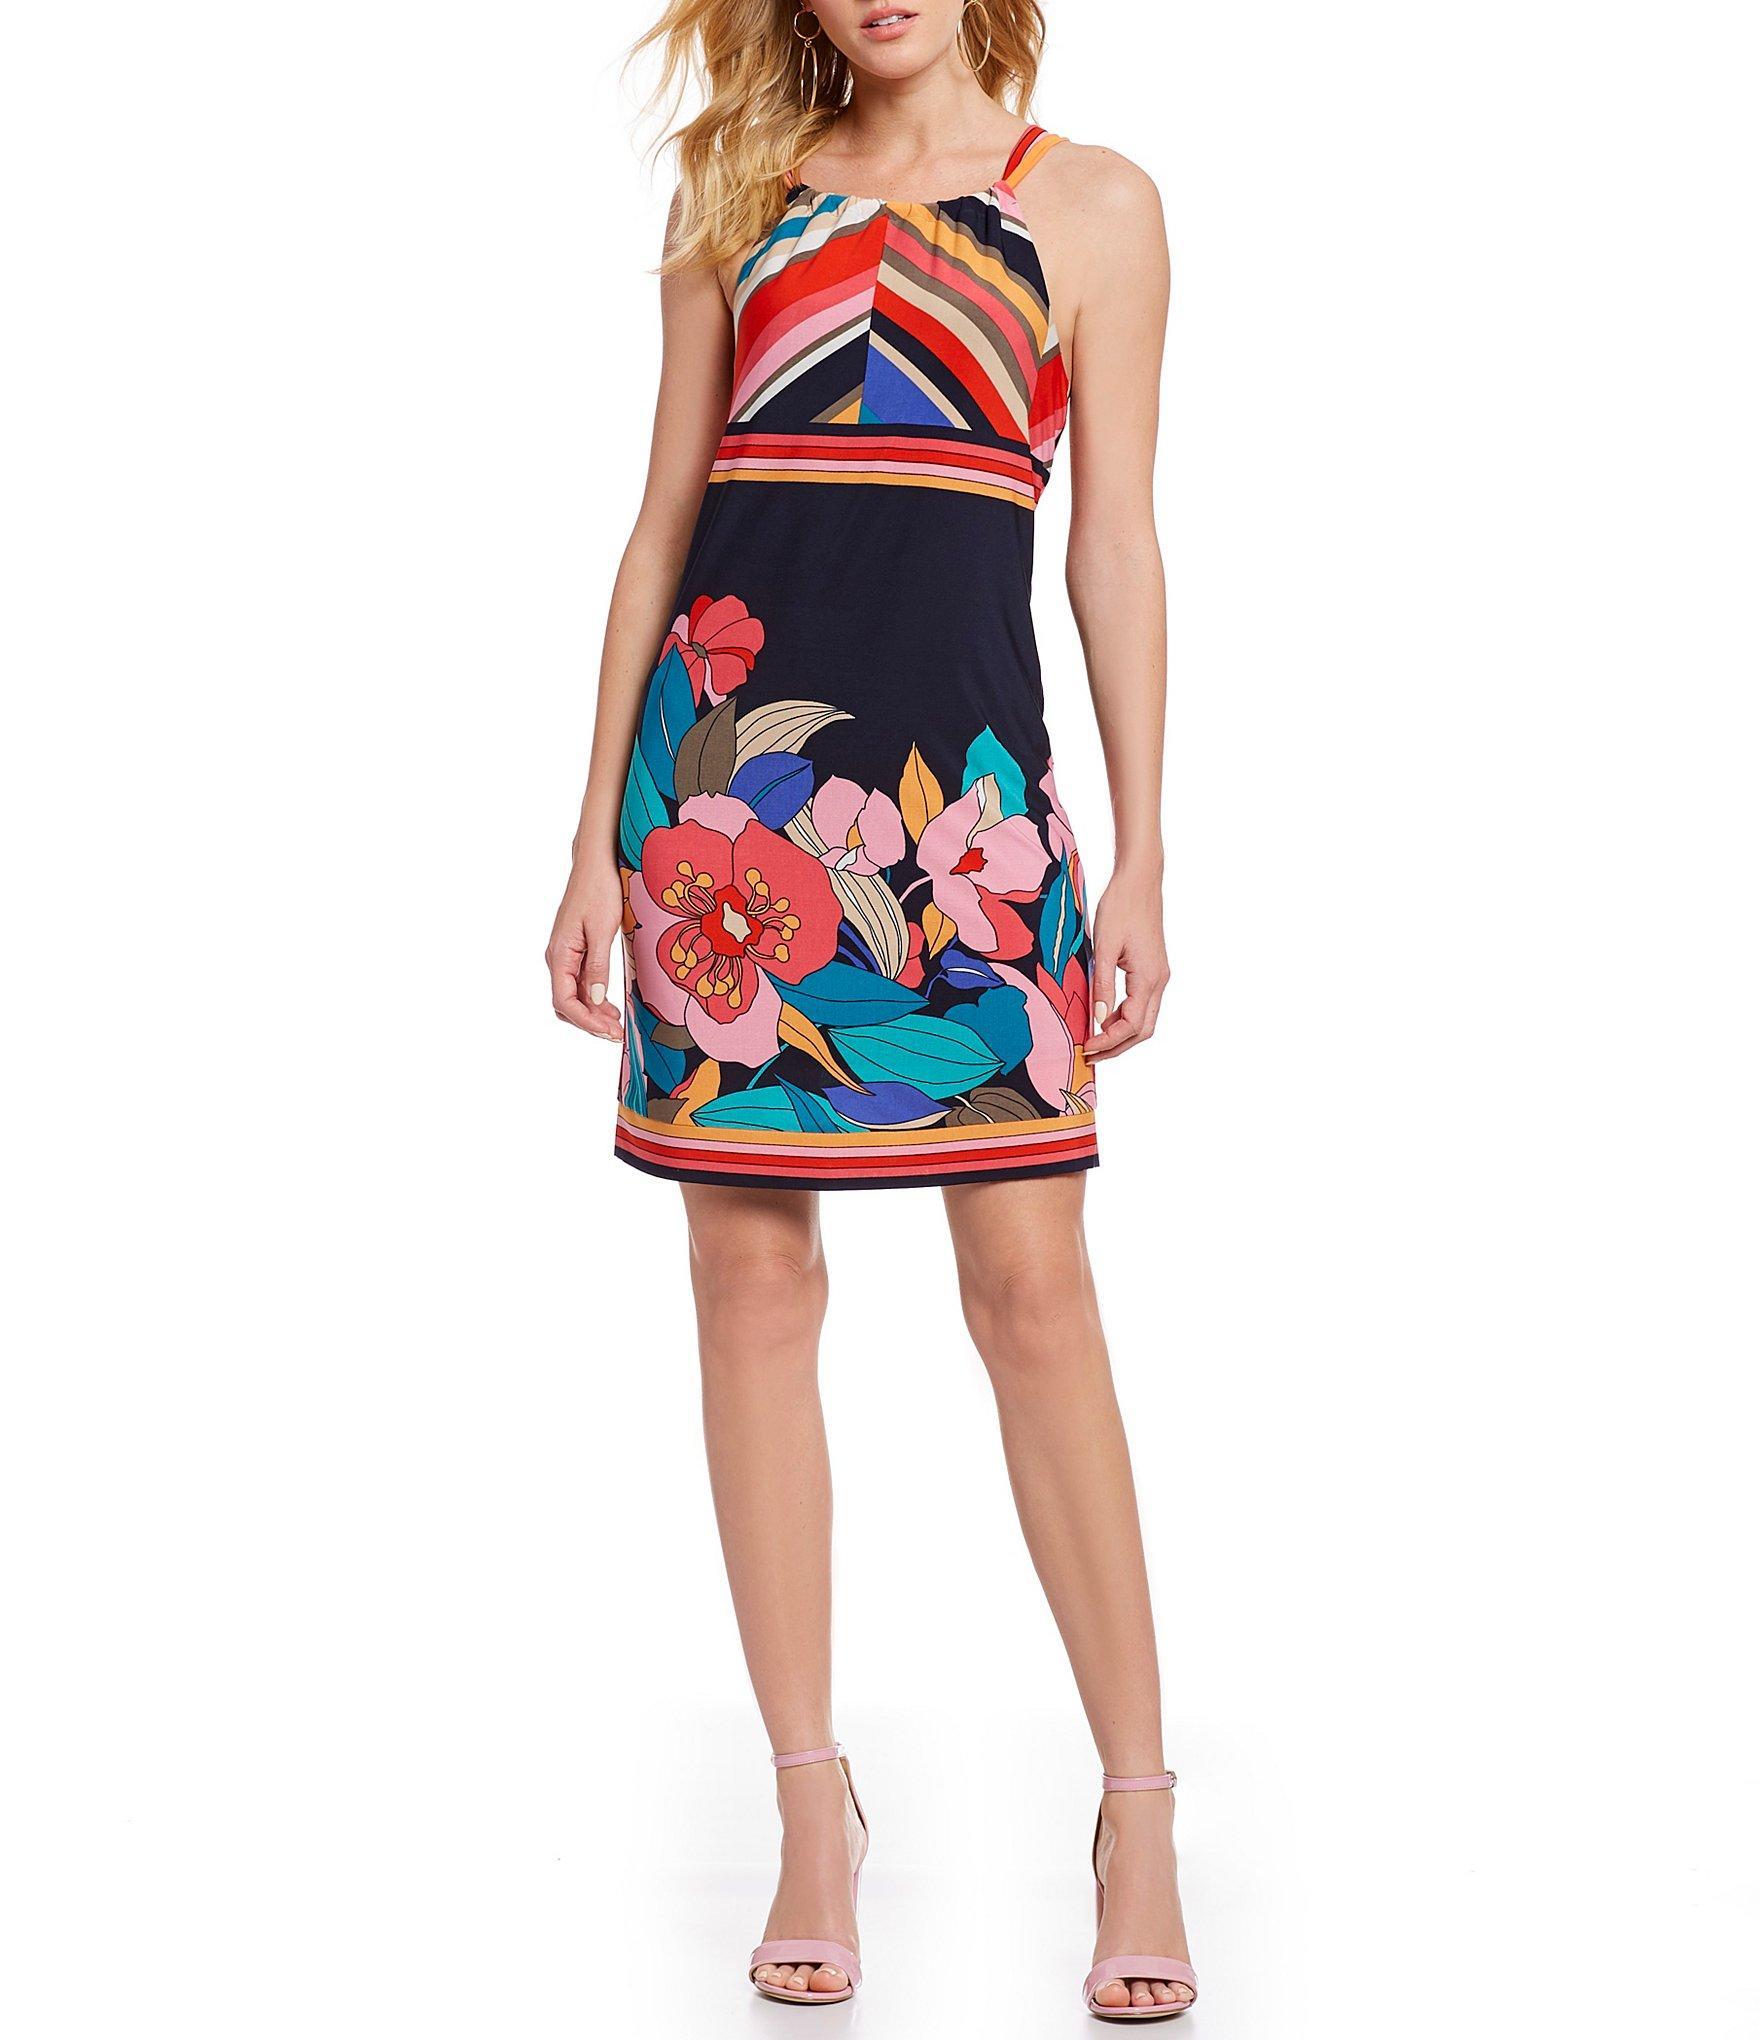 efeefbf1b52 Trina Turk. Women s Mixed Print Halter Dress